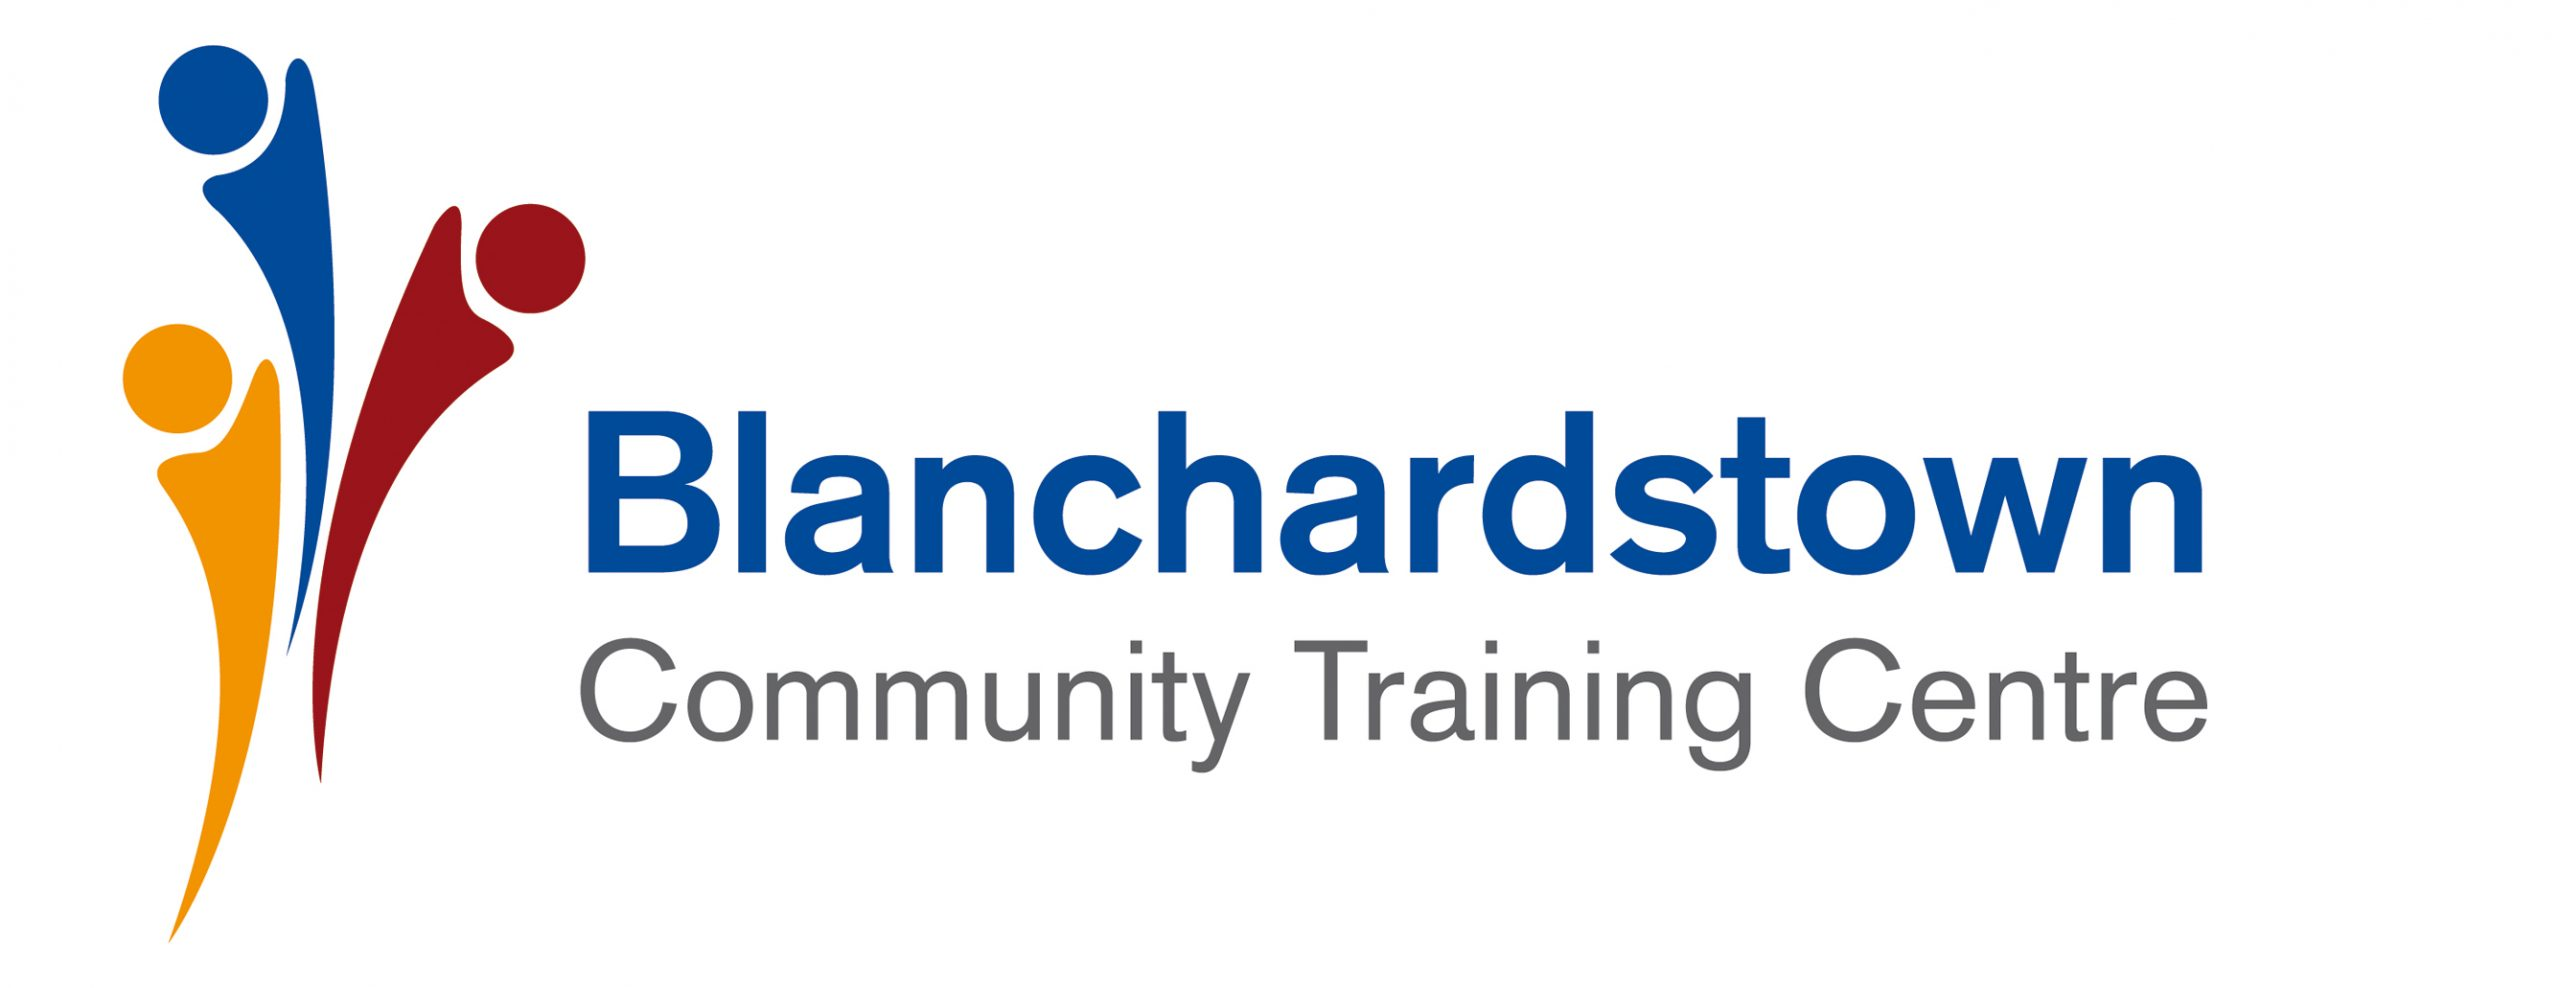 Blanchardstown